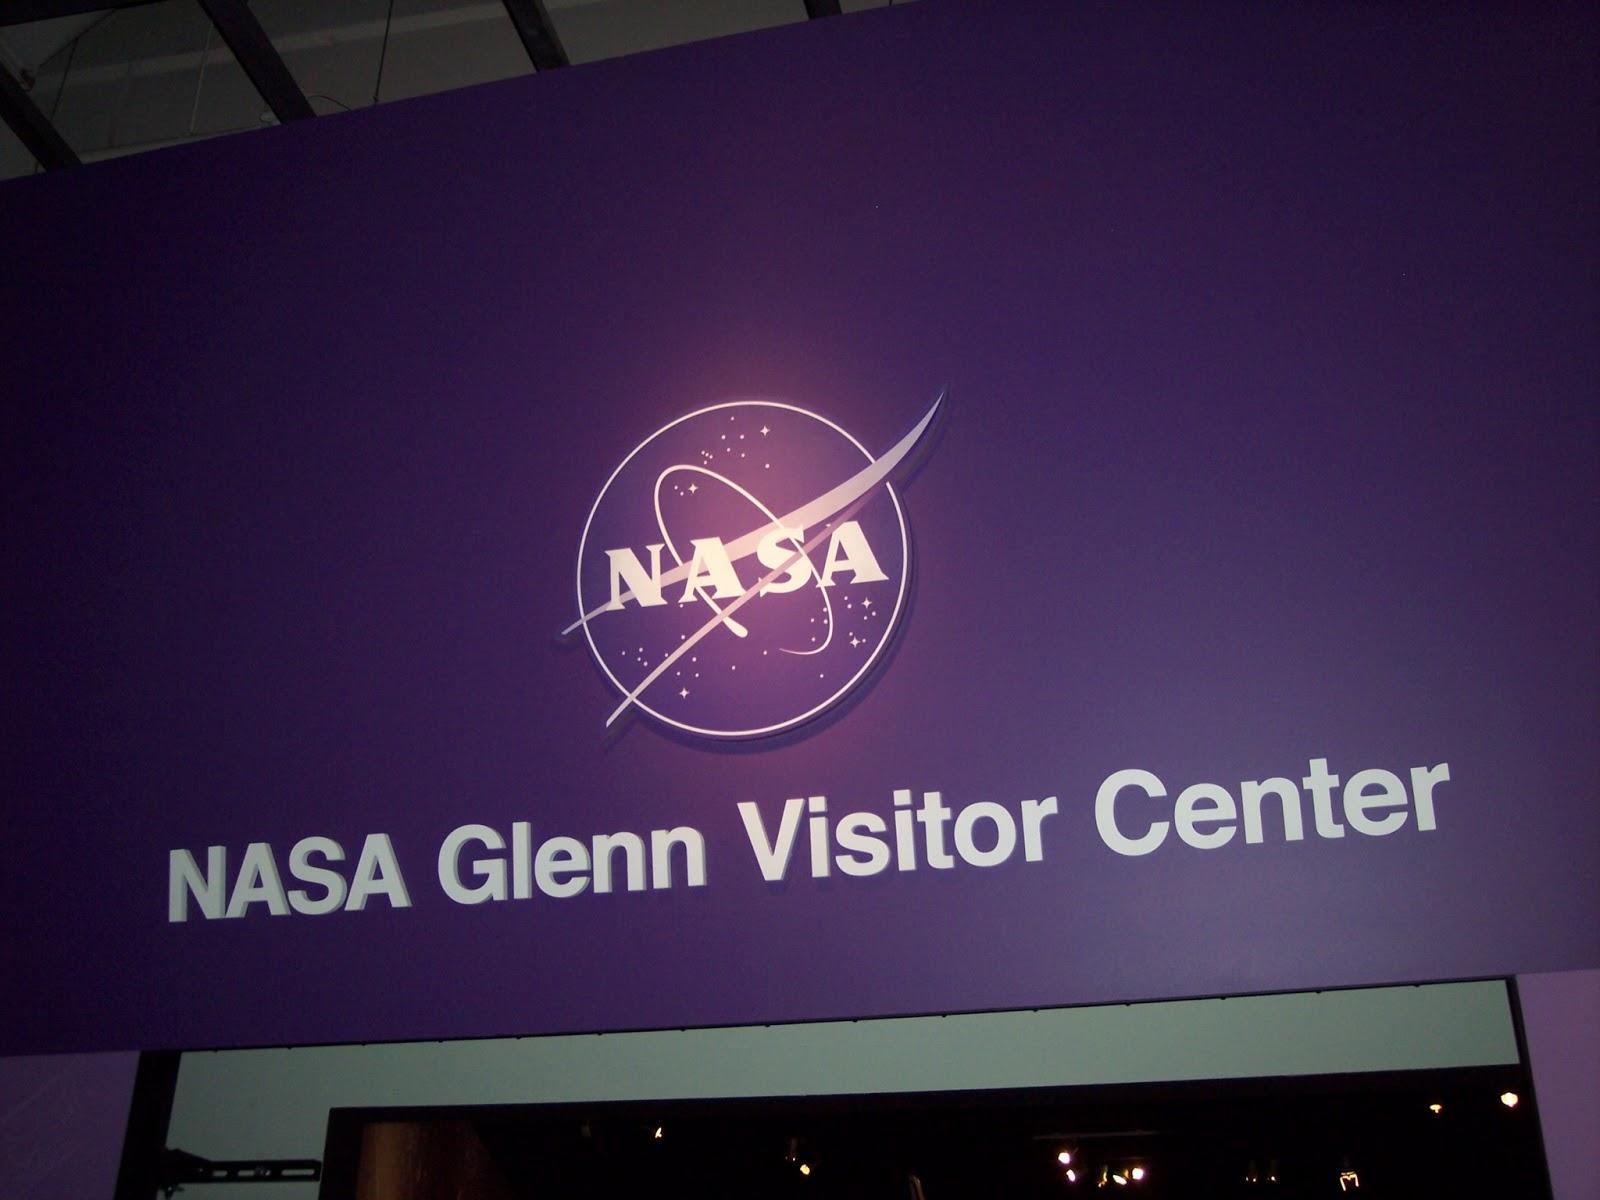 nasa glenn visitor center - HD1600×1200